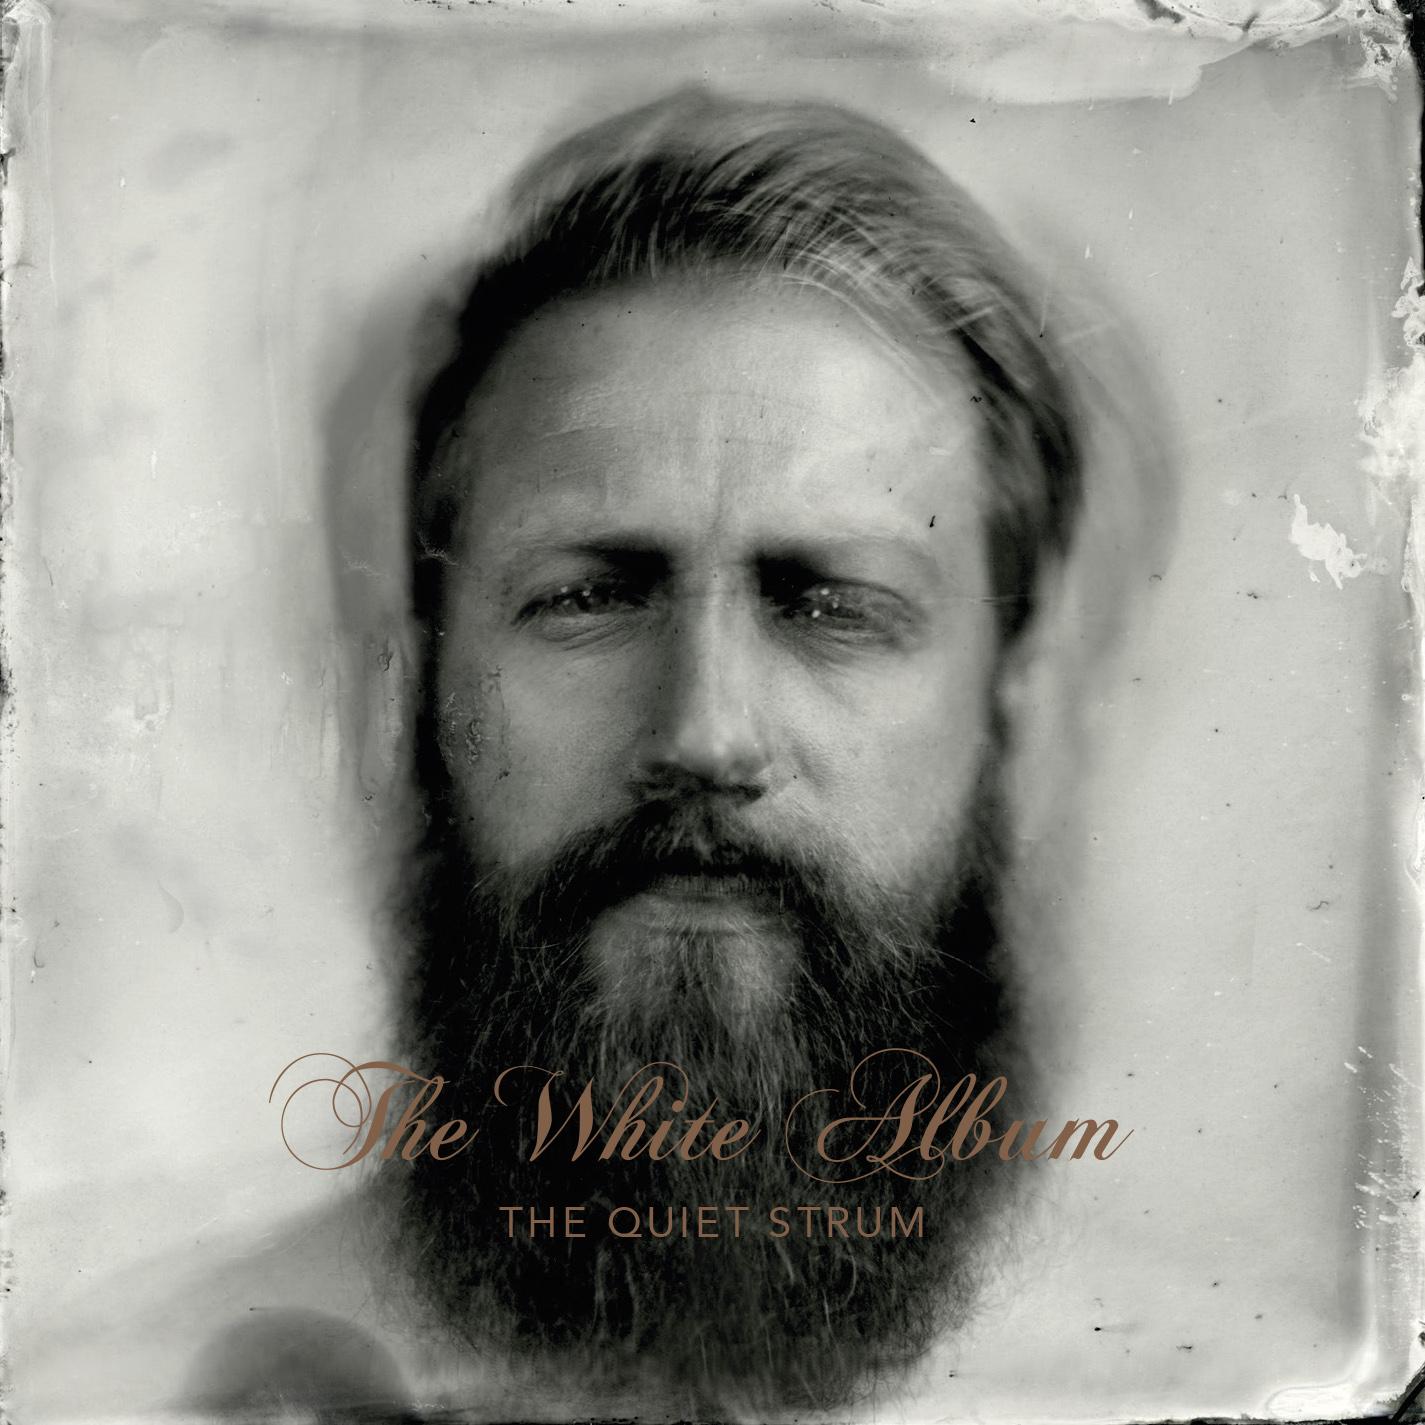 the black and white album